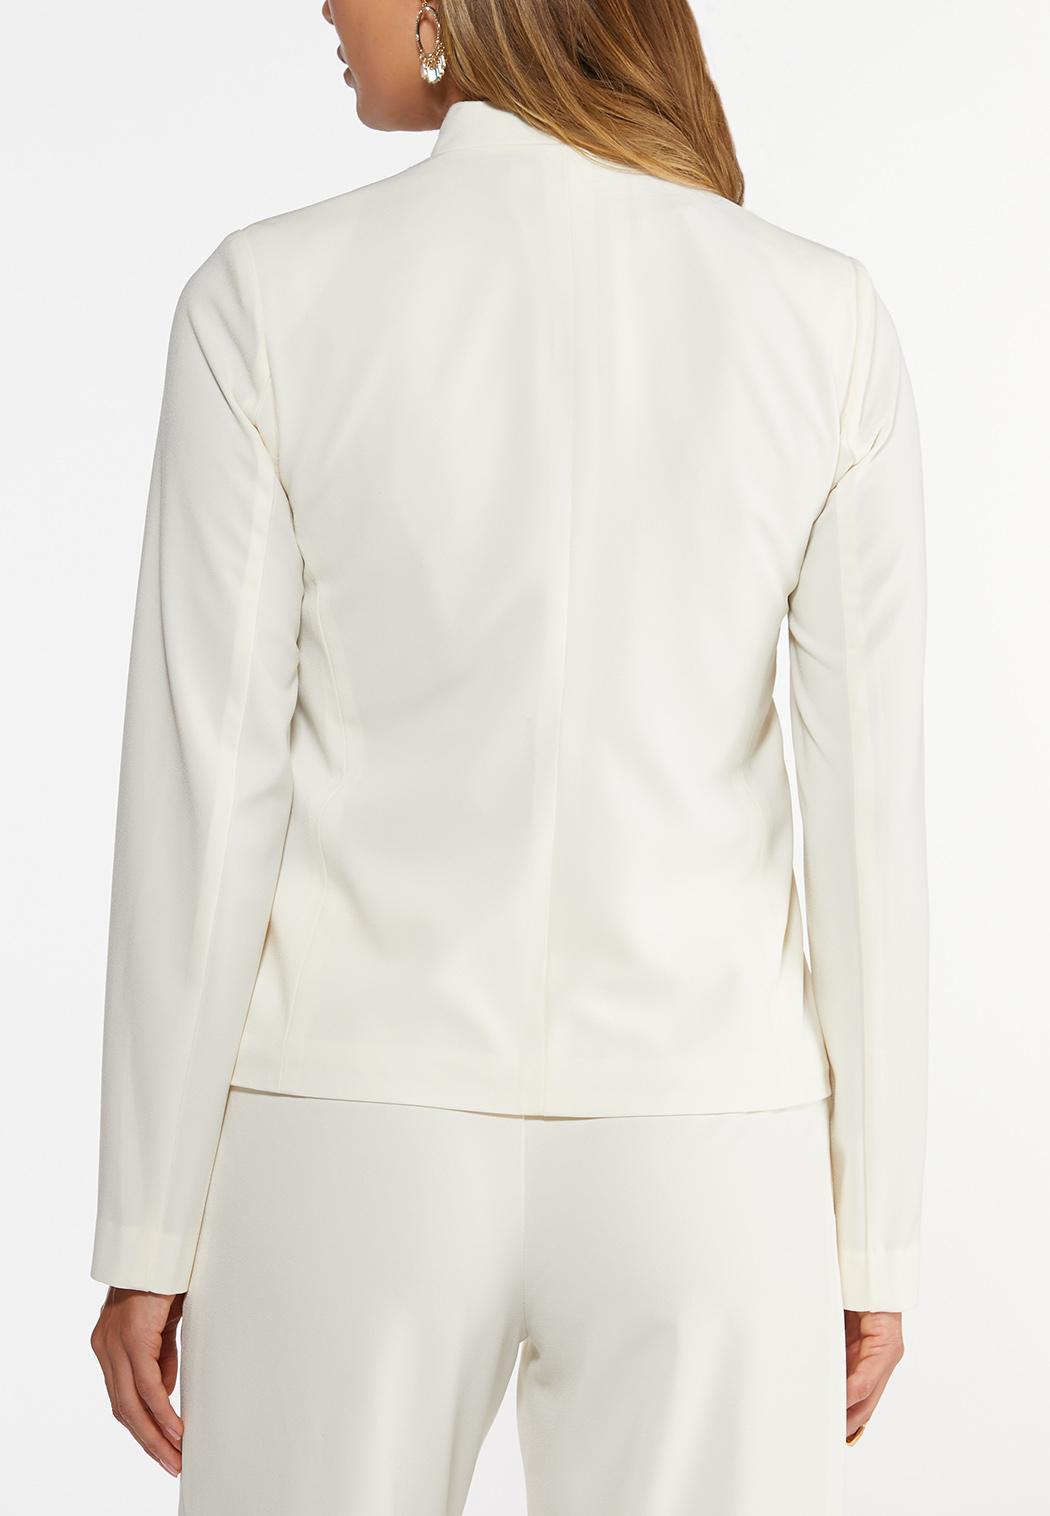 Plus Size Solid Crepe Blazer (Item #44395867)